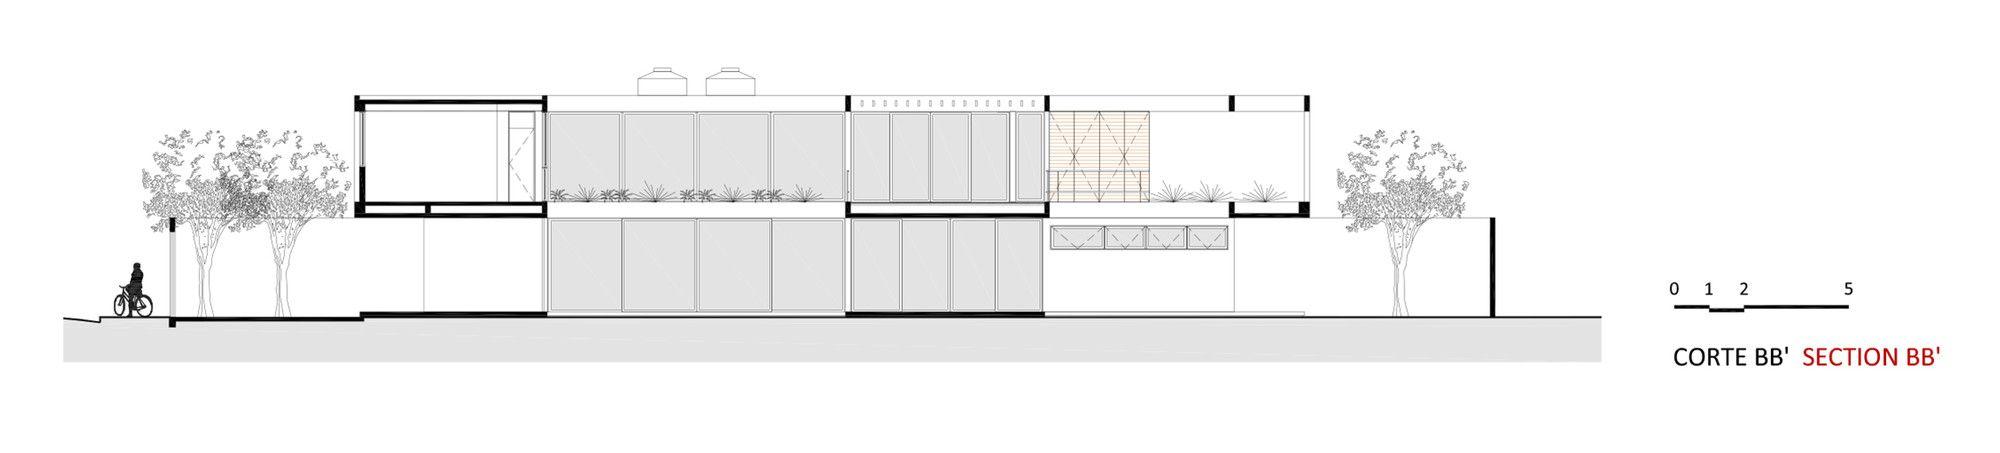 Galeria de Casa Jardins / CR2 Arquitetura - 25